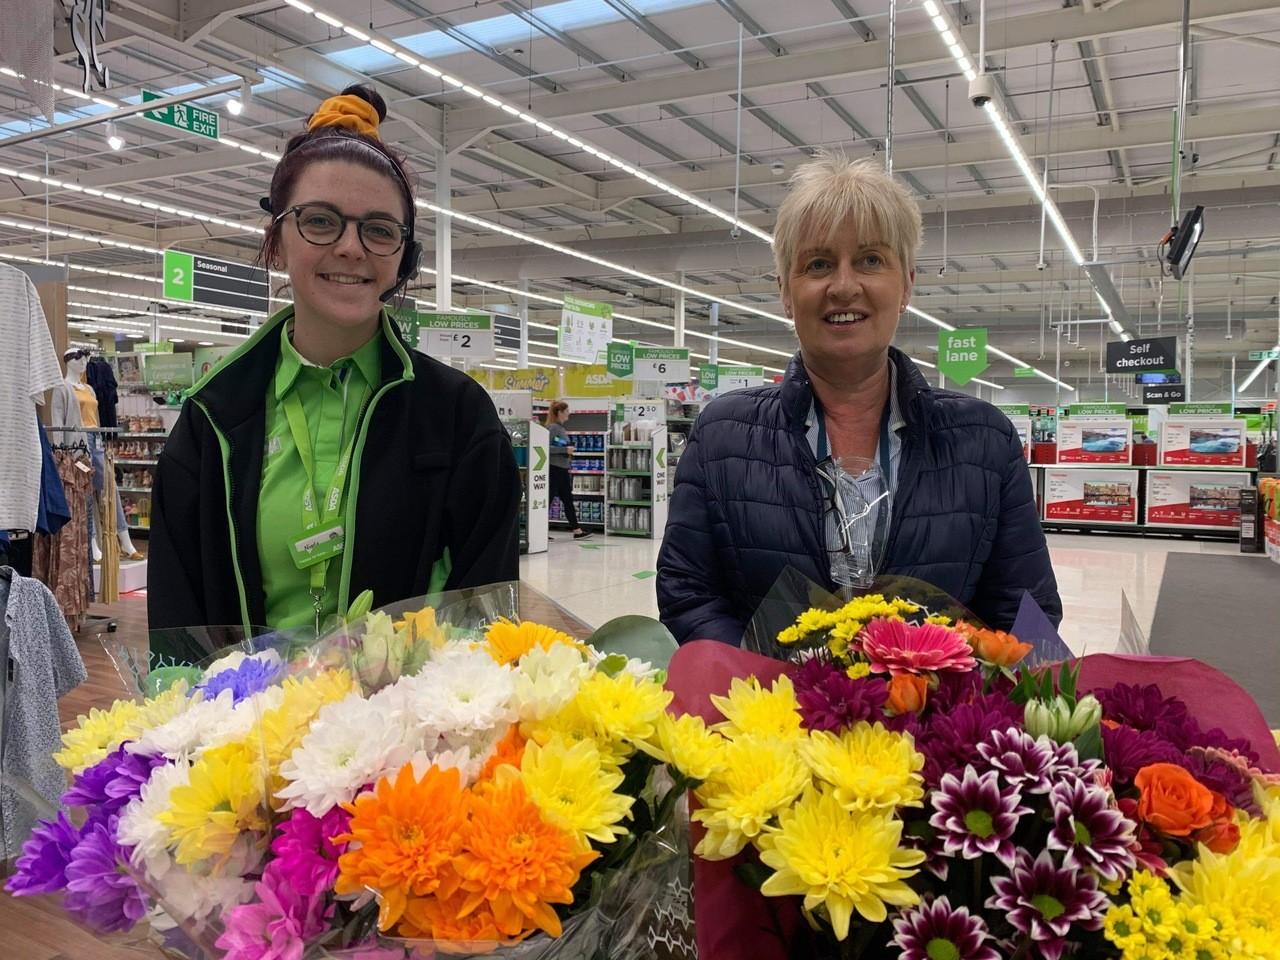 This week's community donations | Asda Portadown